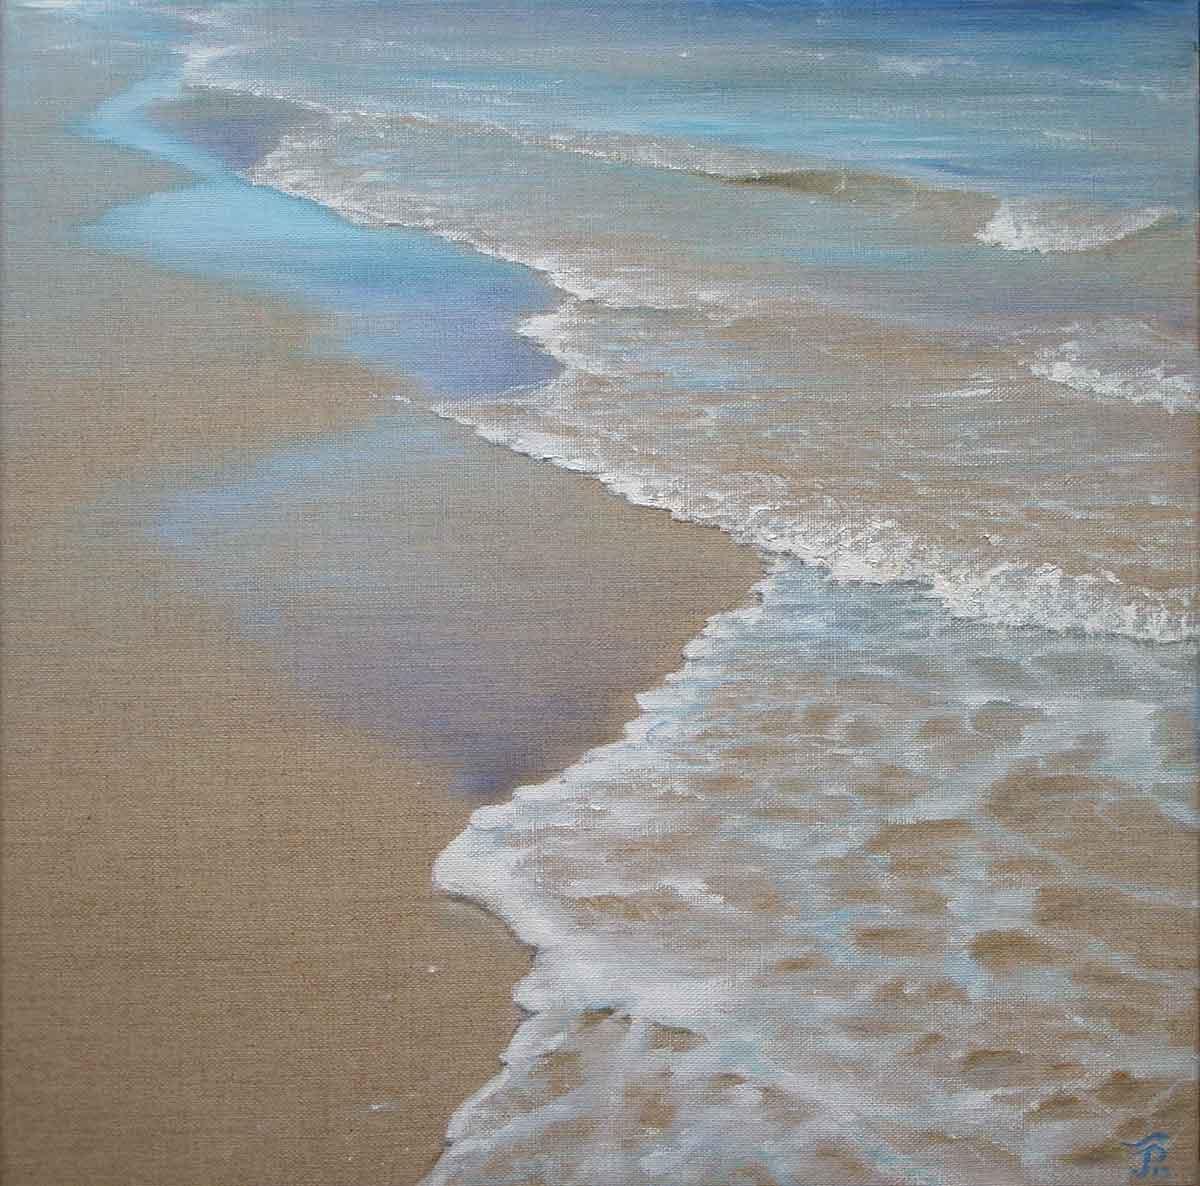 Strandlauf II